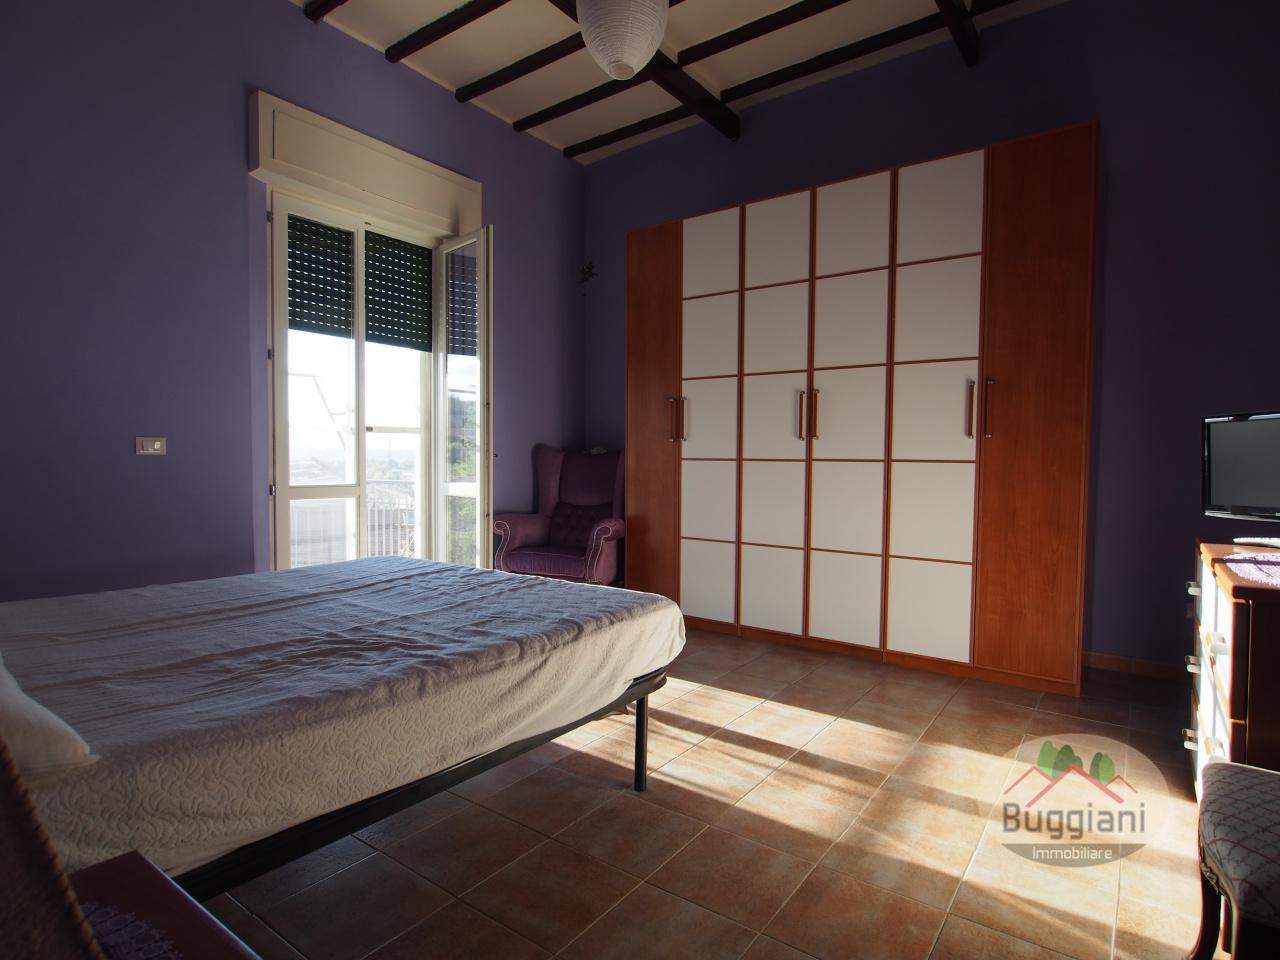 Appartamento in vendita RIF. 1836, Montopoli in Val d'Arno (PI)